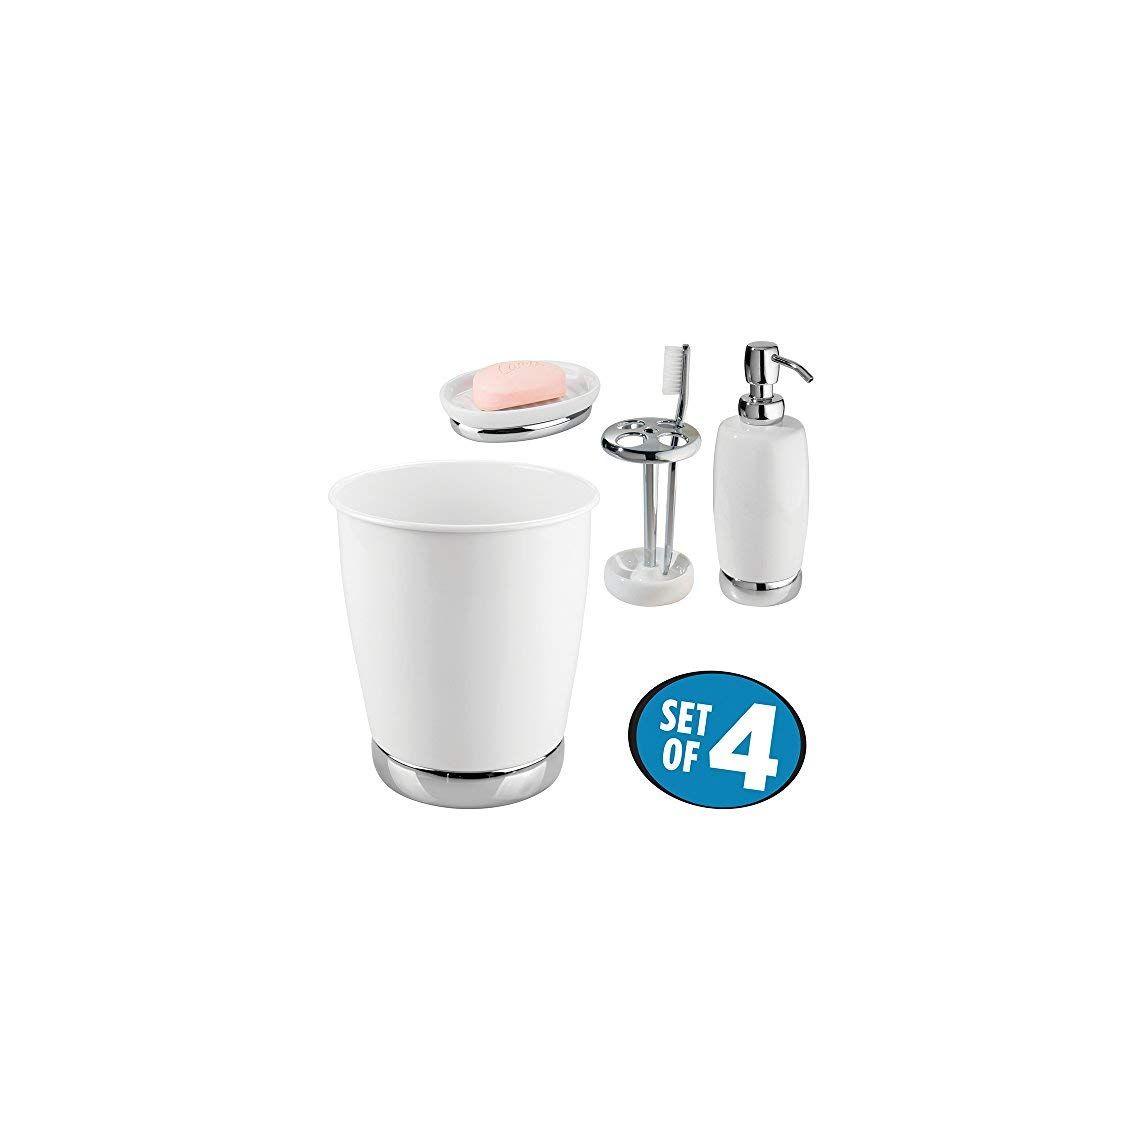 Mdesign Bath Accessory Set Soap Dispenser Pump Toothbrush Holder